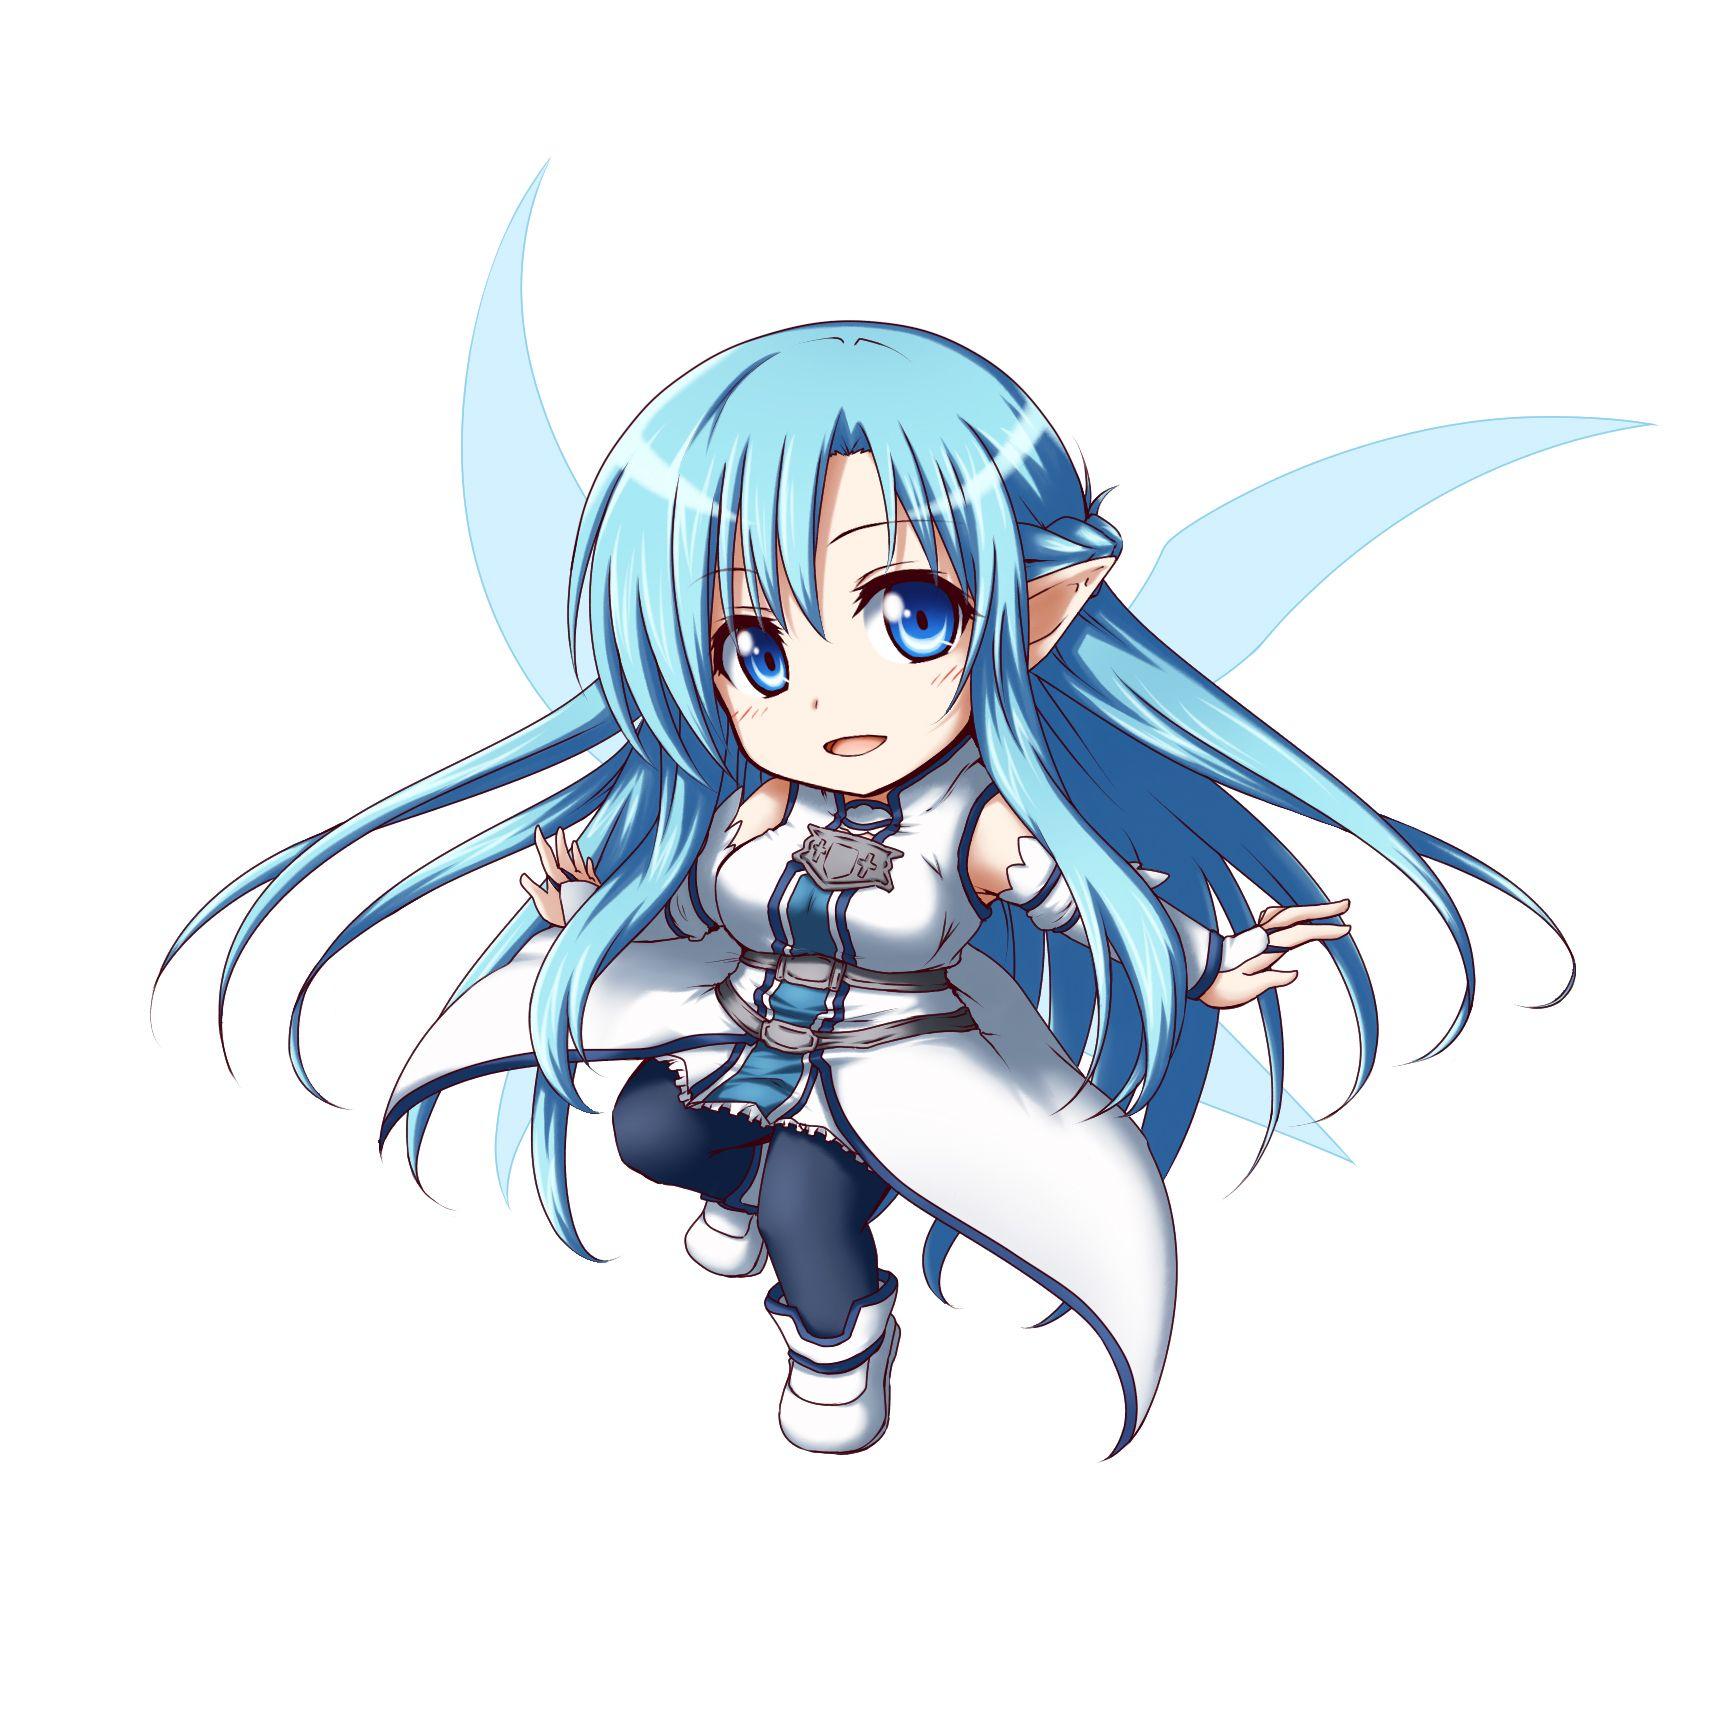 Asuna (ALO) by Kuena Sword art online, Art, Images